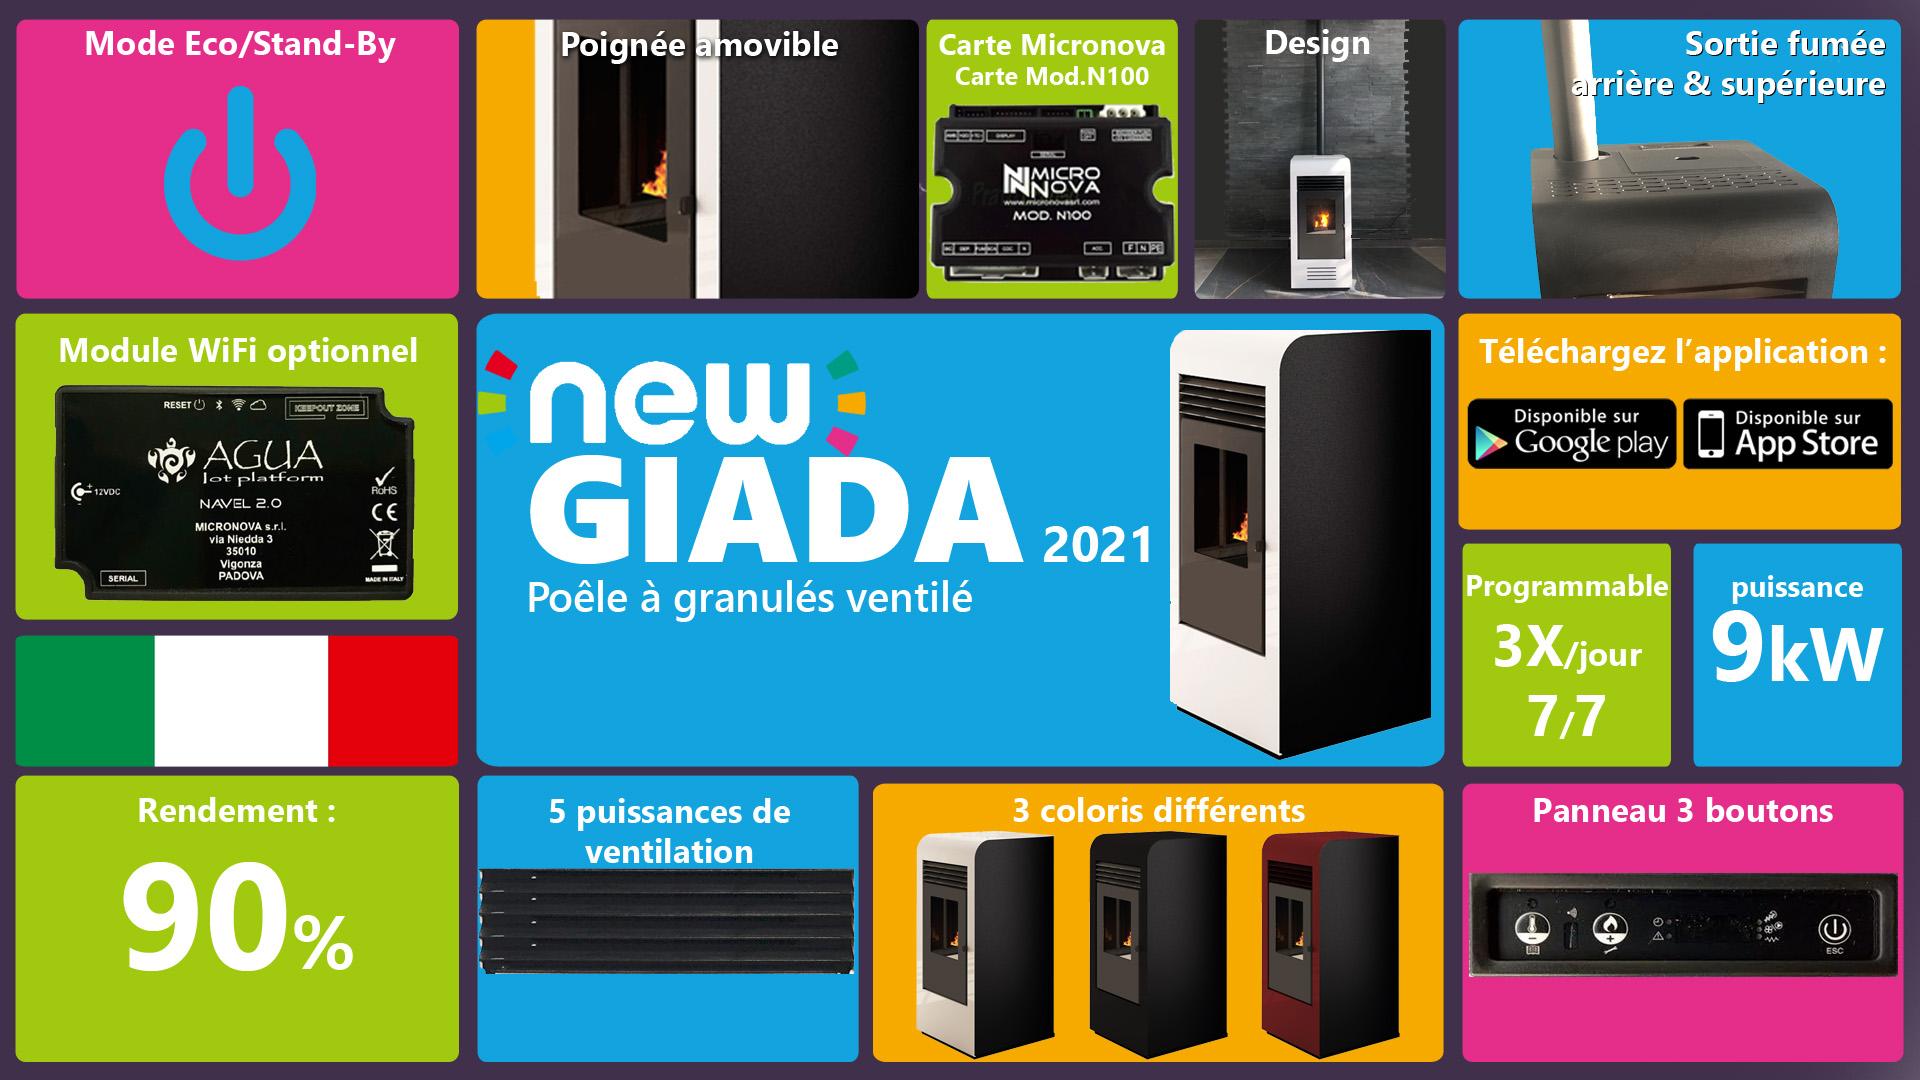 New_Giada_1.jpg